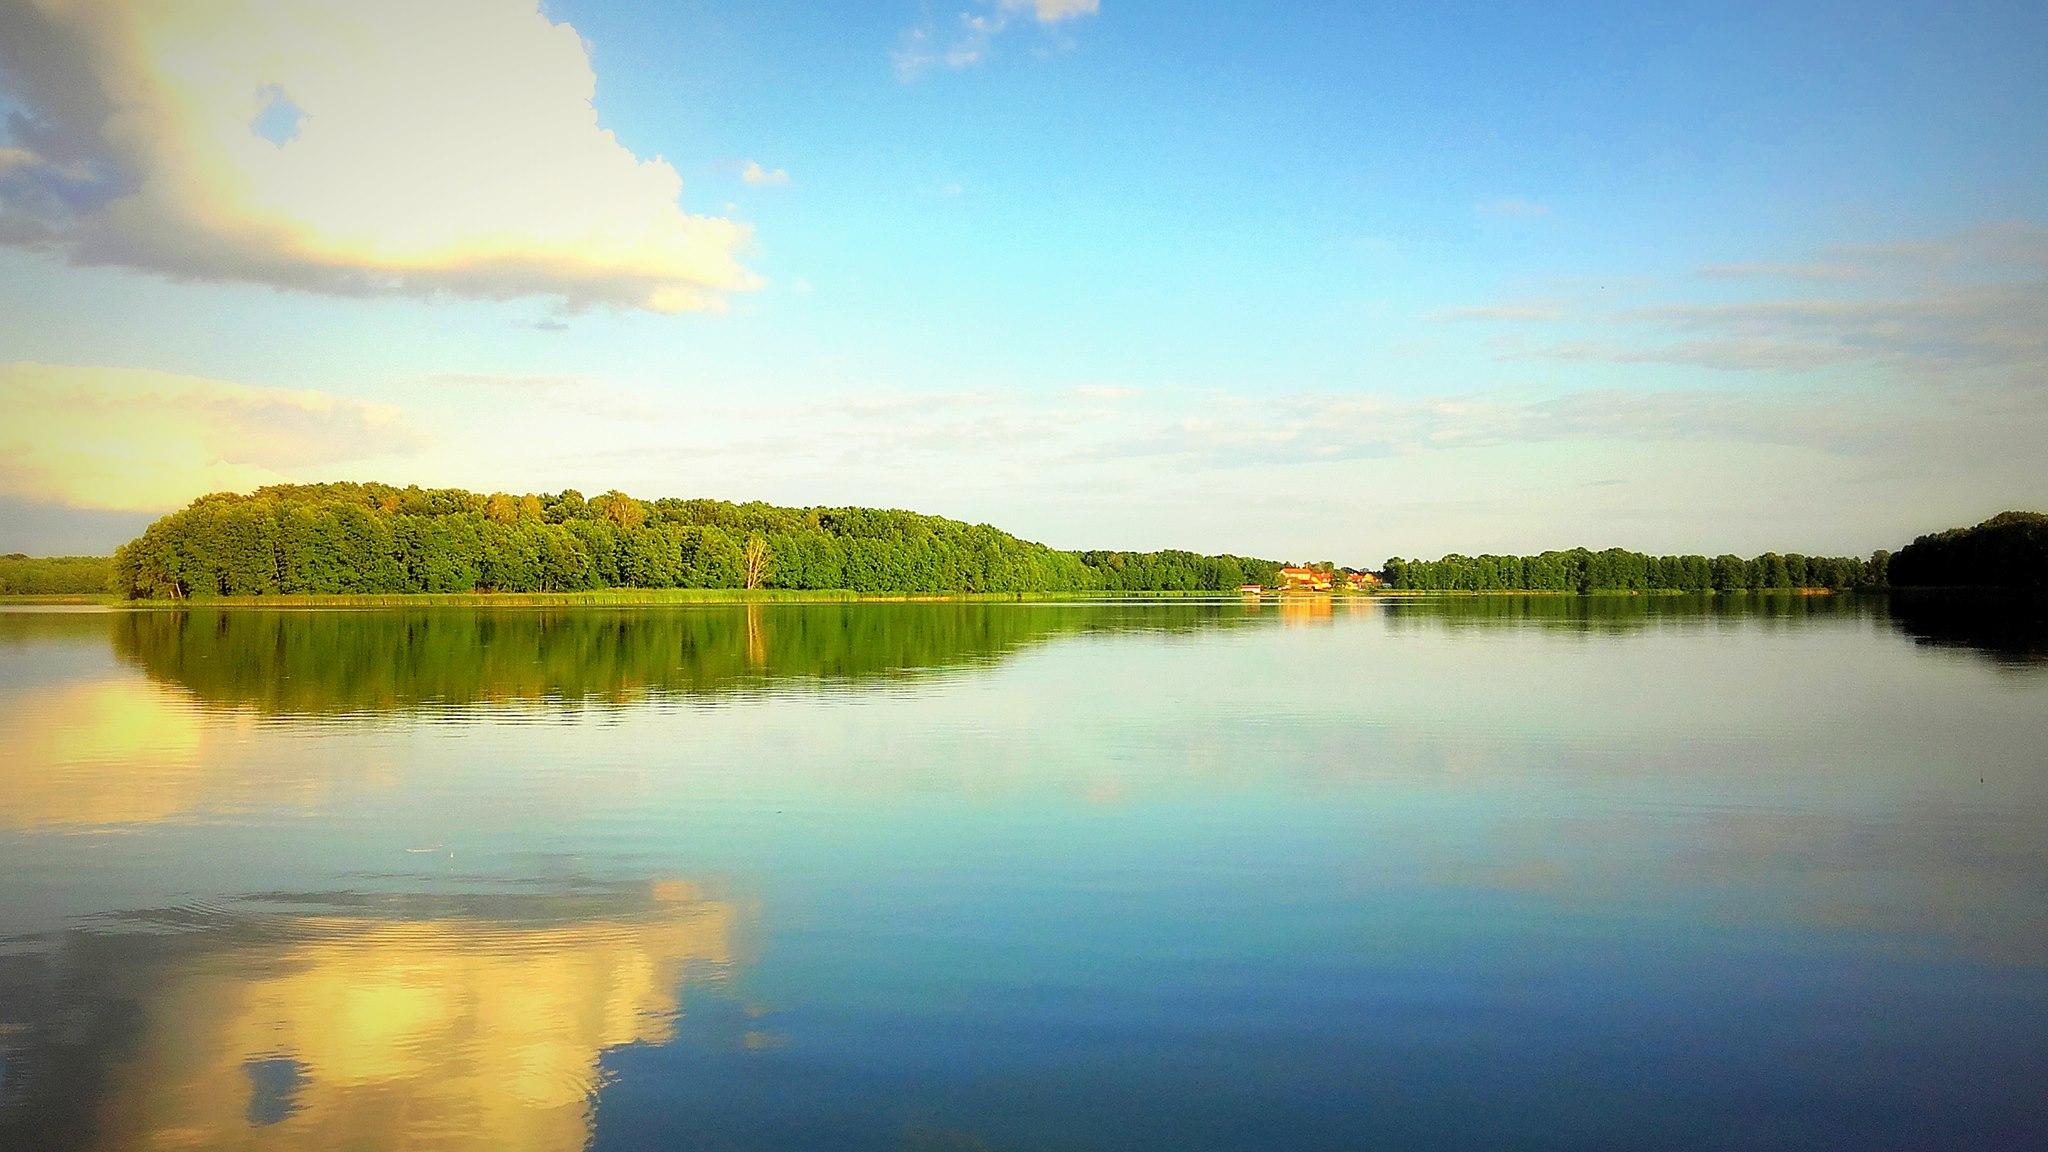 Jesionka - widok na cypel i jezioro